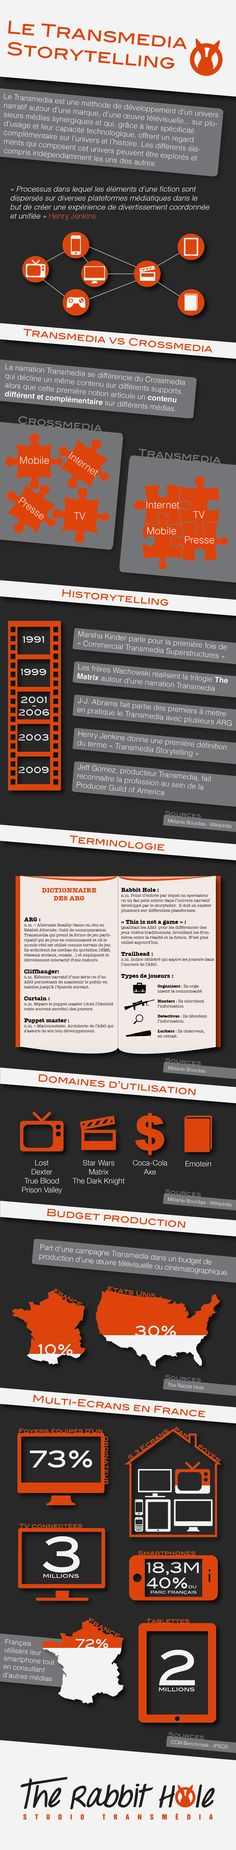 Transmedia & storytelling #socialtv #Infographic in French